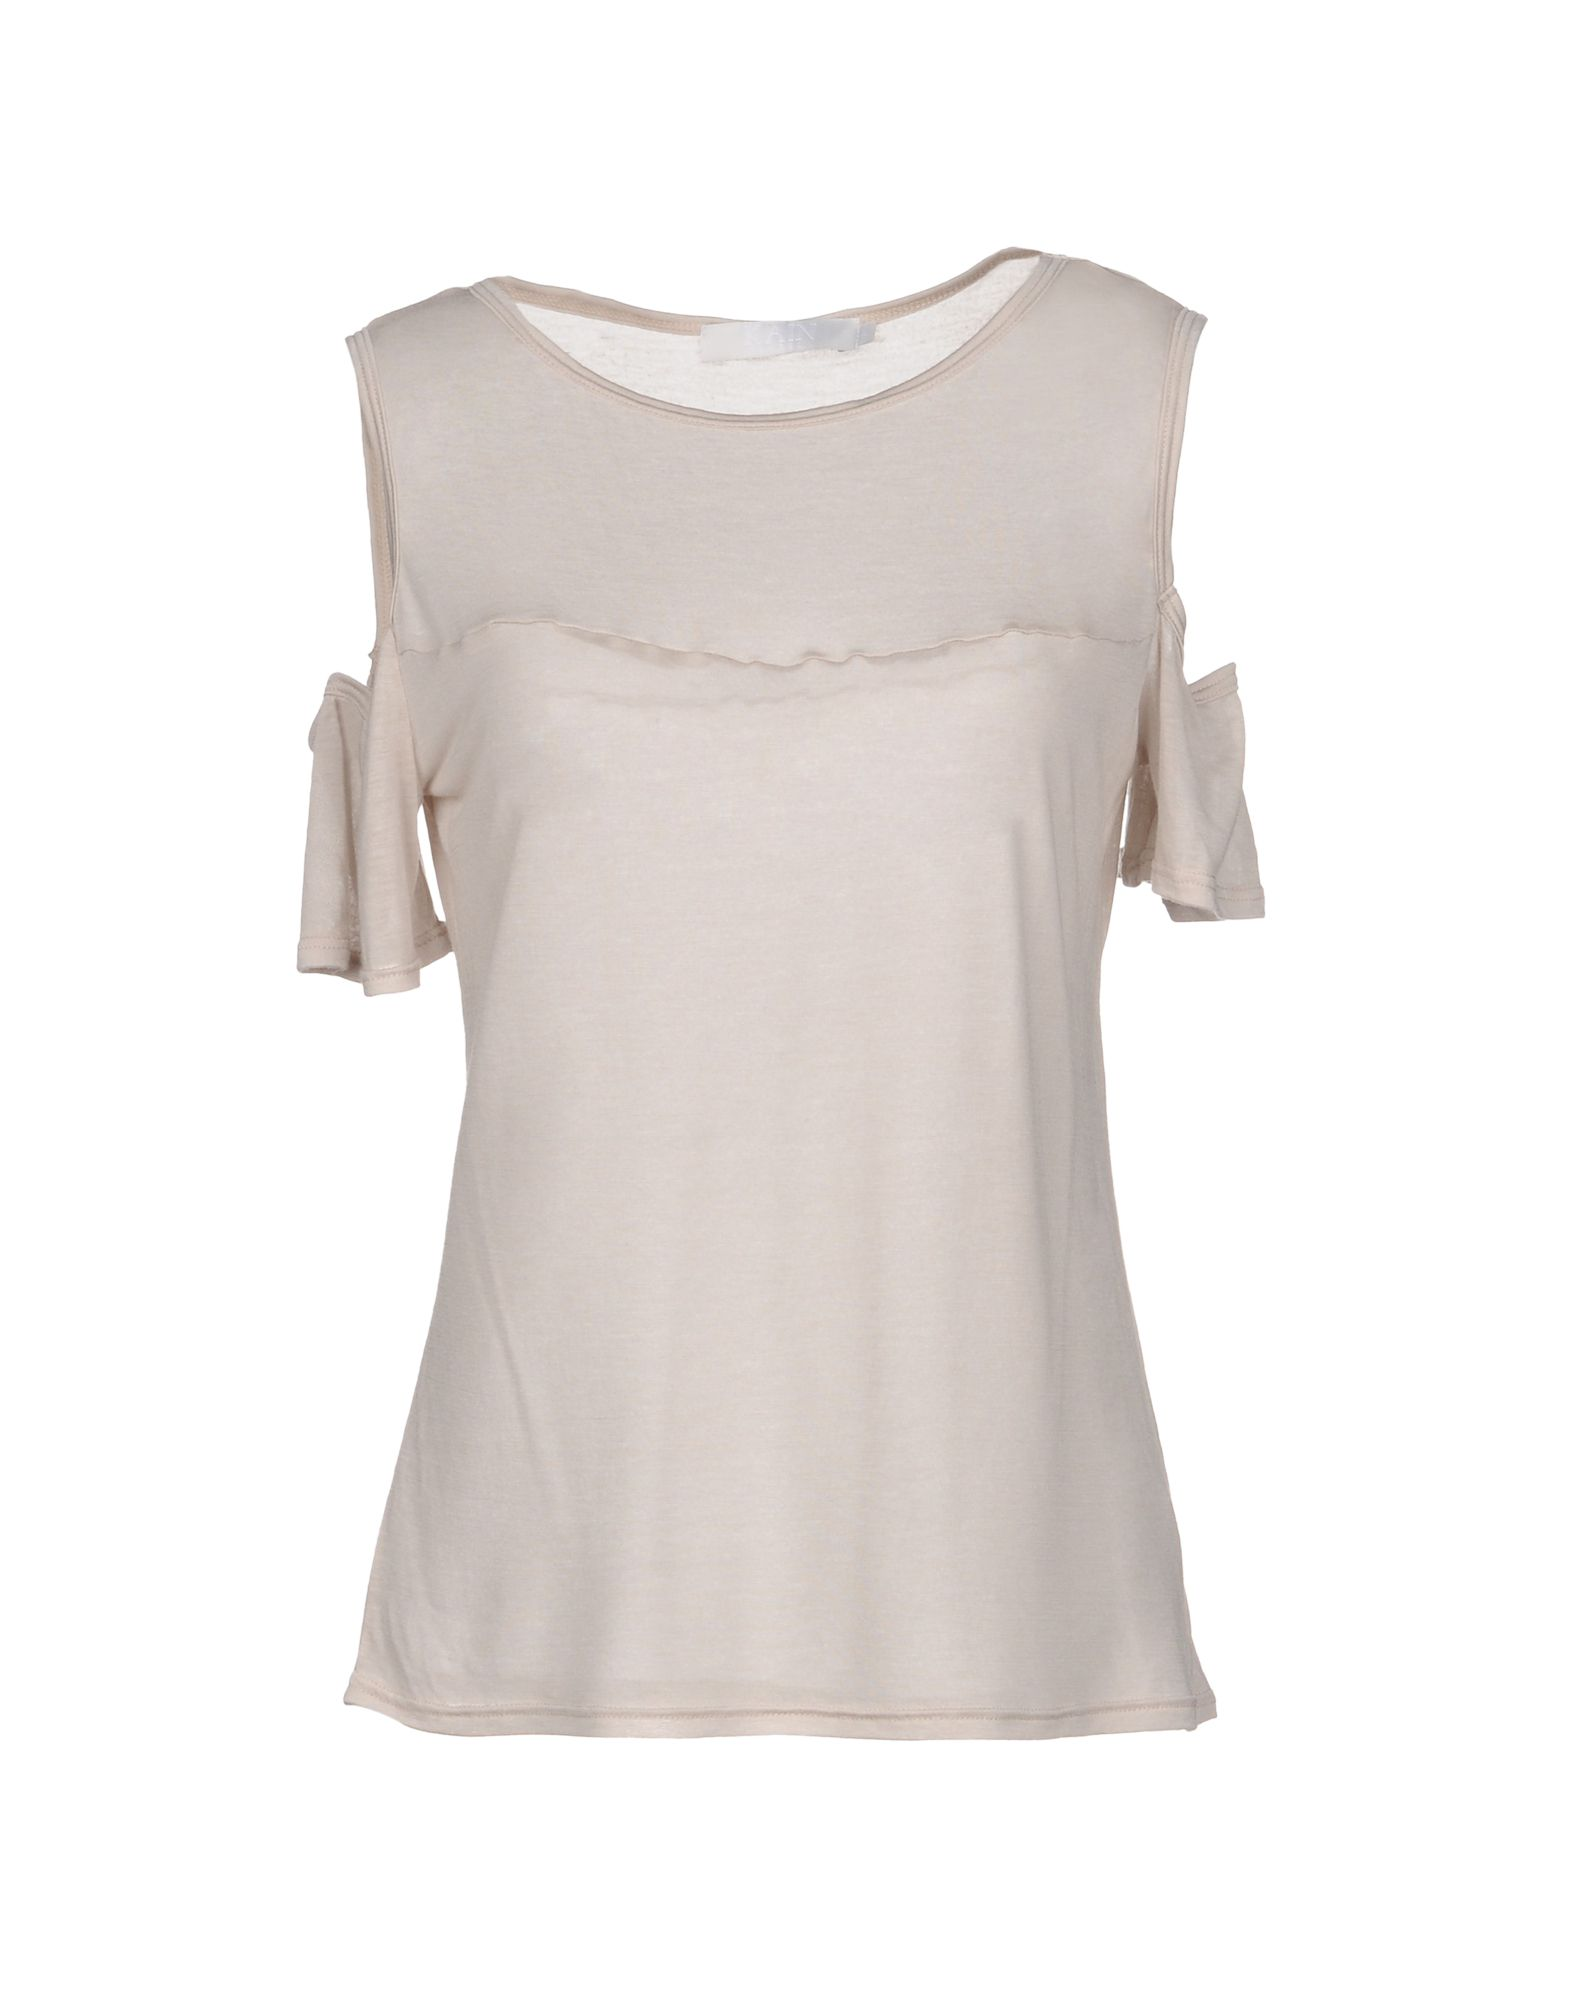 KAIN T-Shirt in Beige